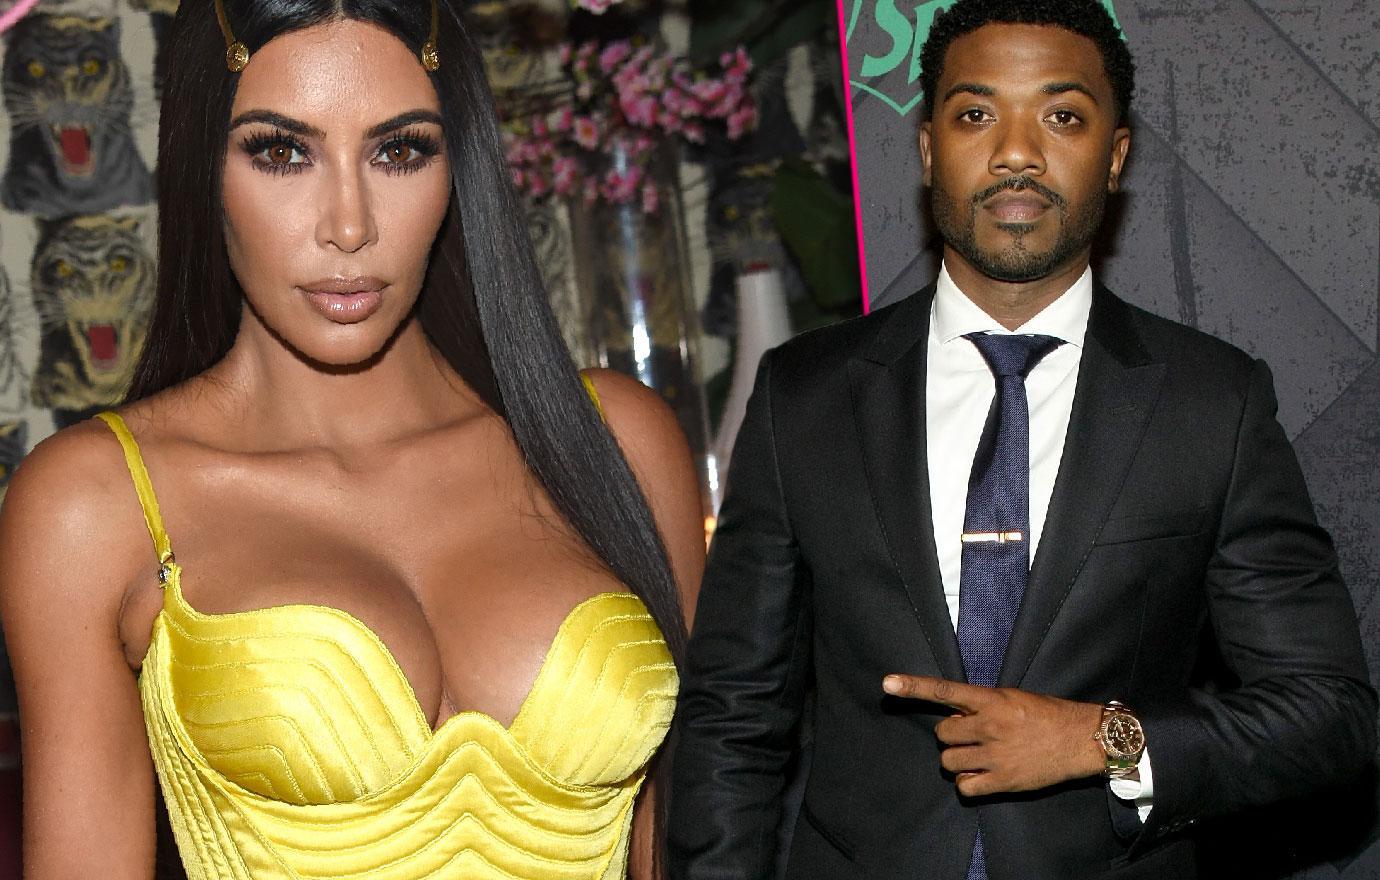 Ray J Claims Kim Kardashian Had Trunk Full Of Sex Toys